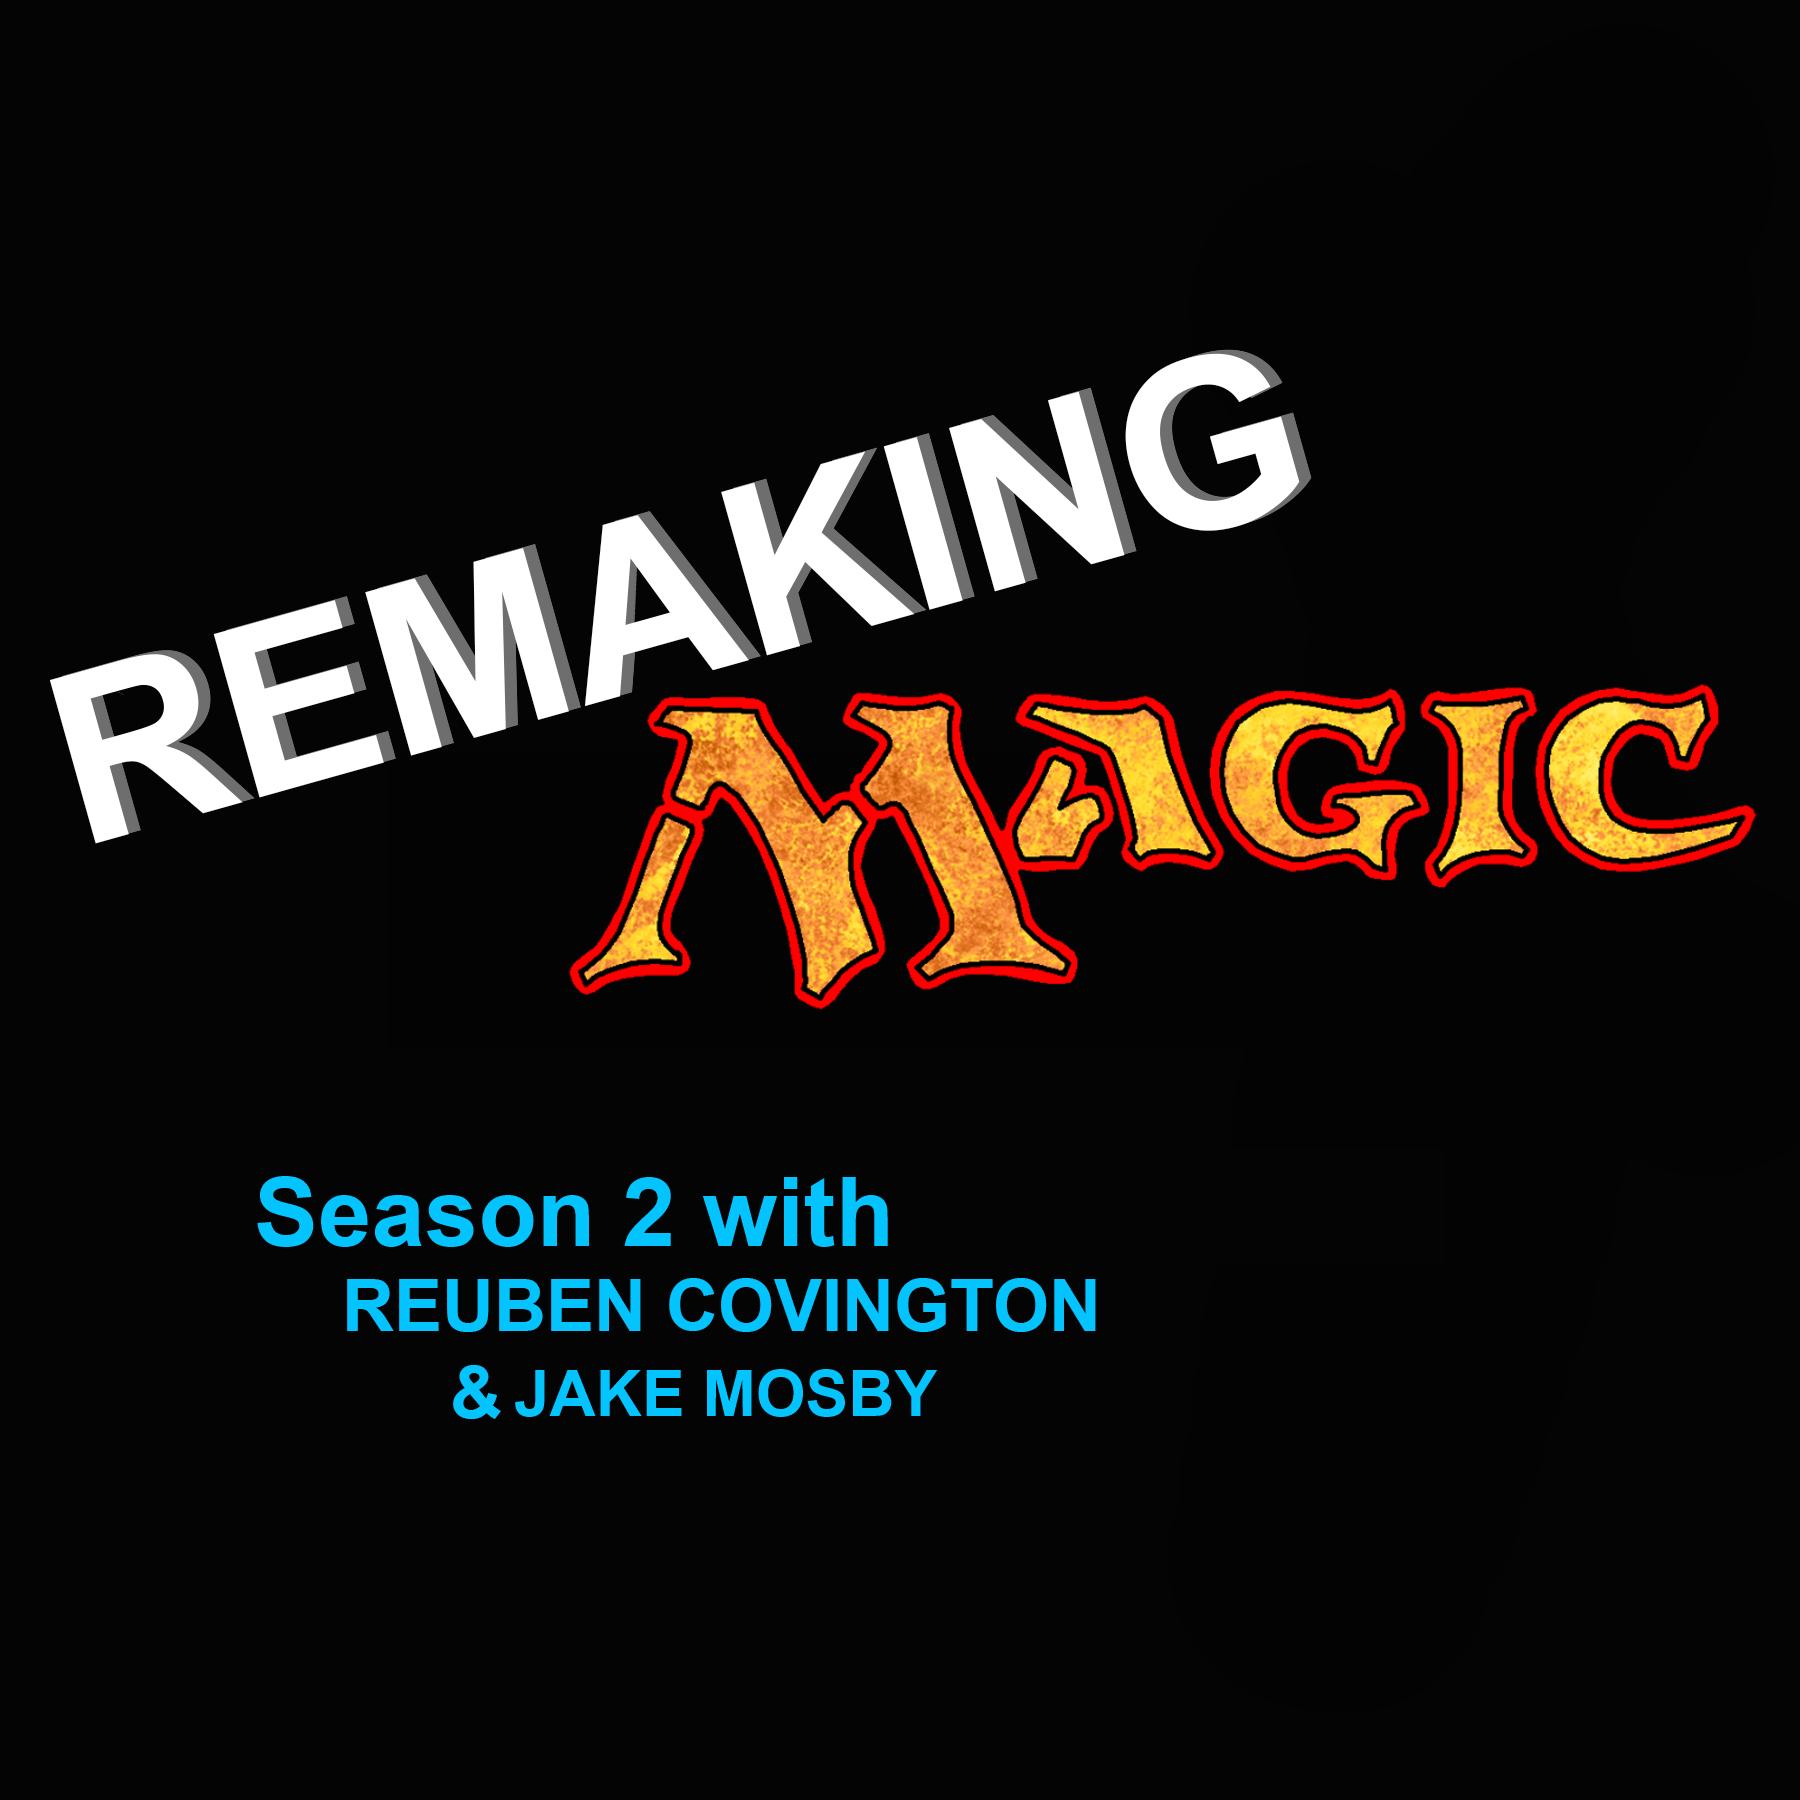 Re-Making Magic S02E05 - GDS3 Trial 1 show art